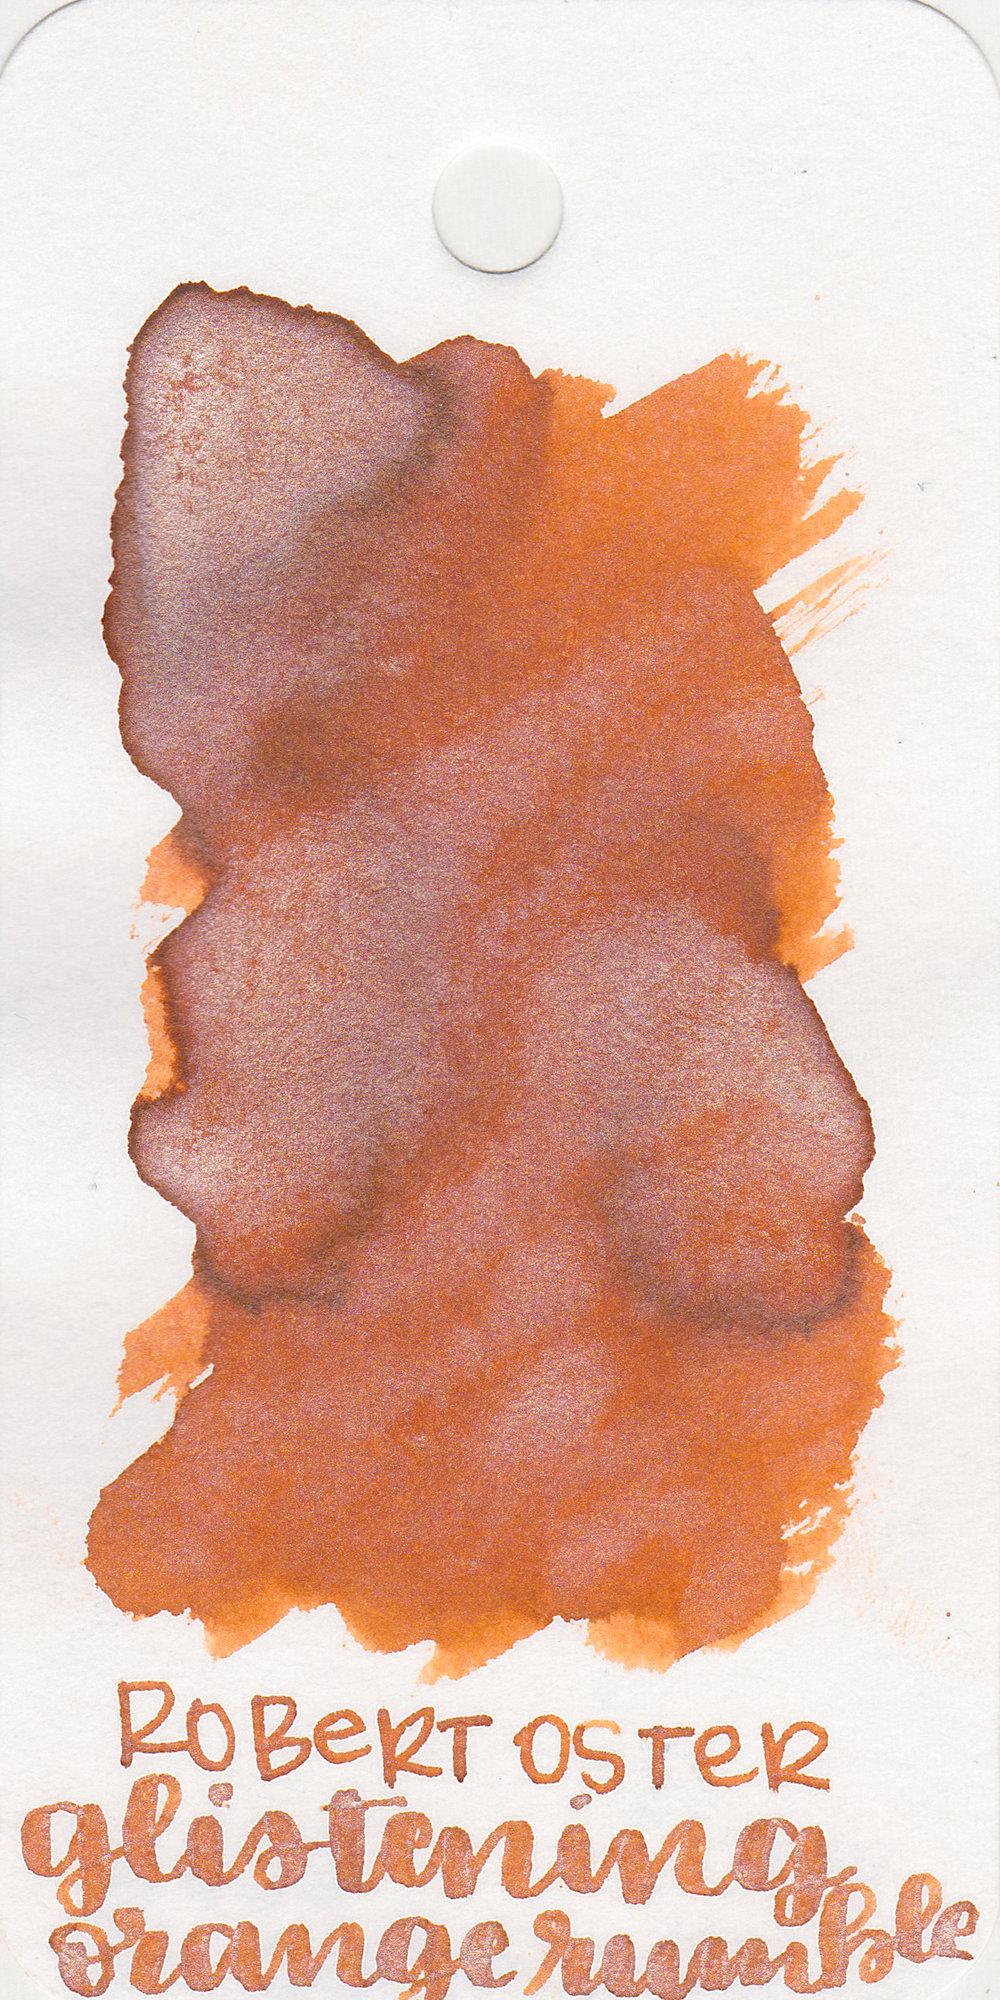 ro-glistening-orange-rumble-1.jpg